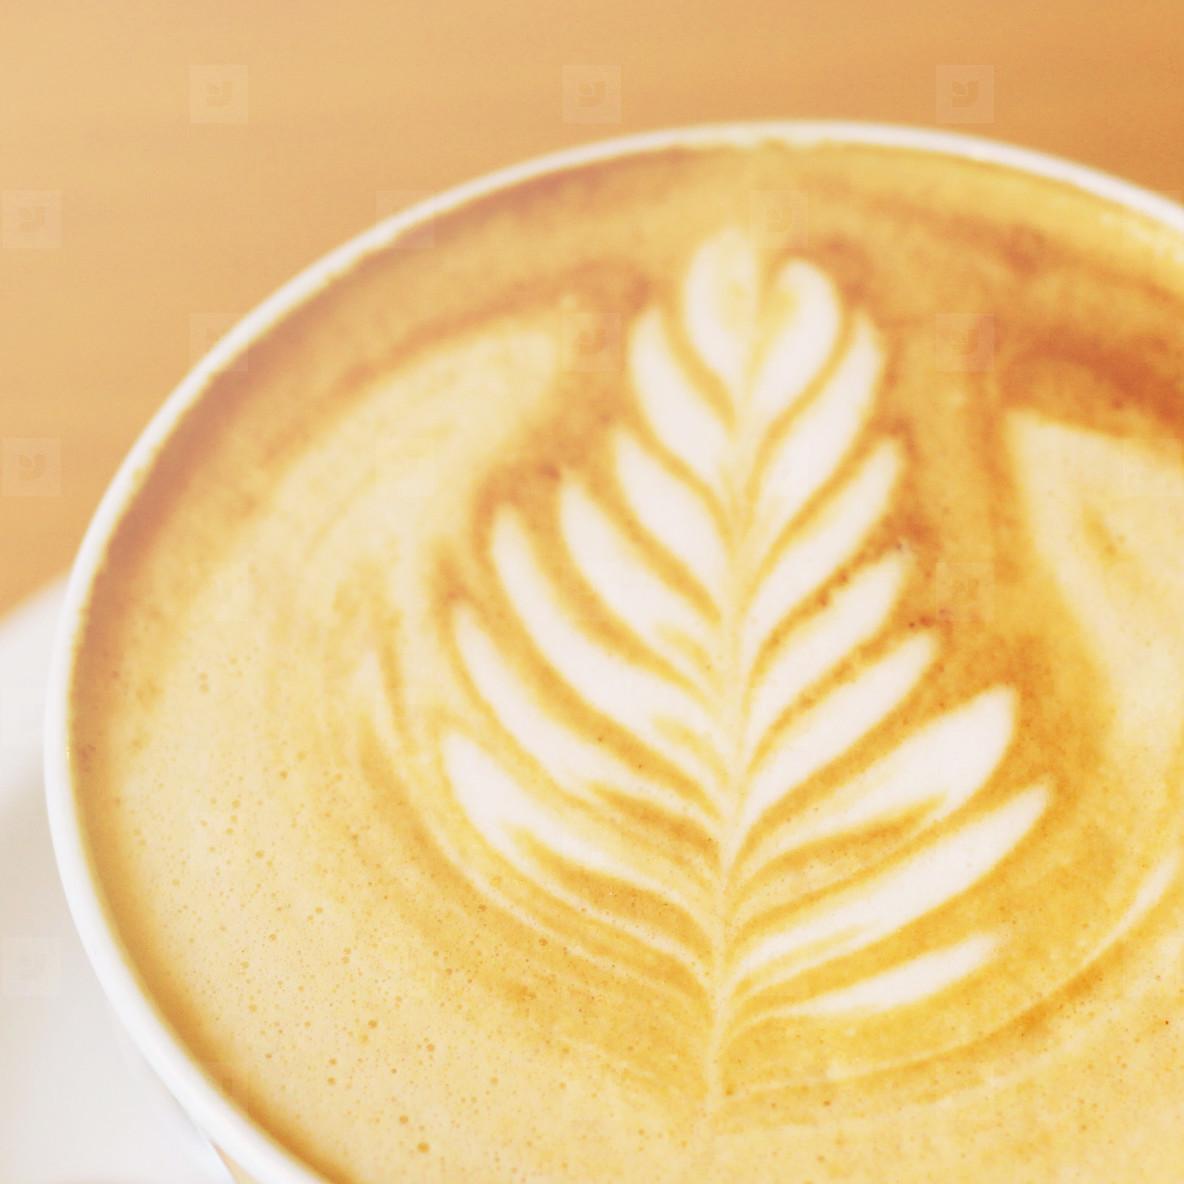 art latte or cappuccino